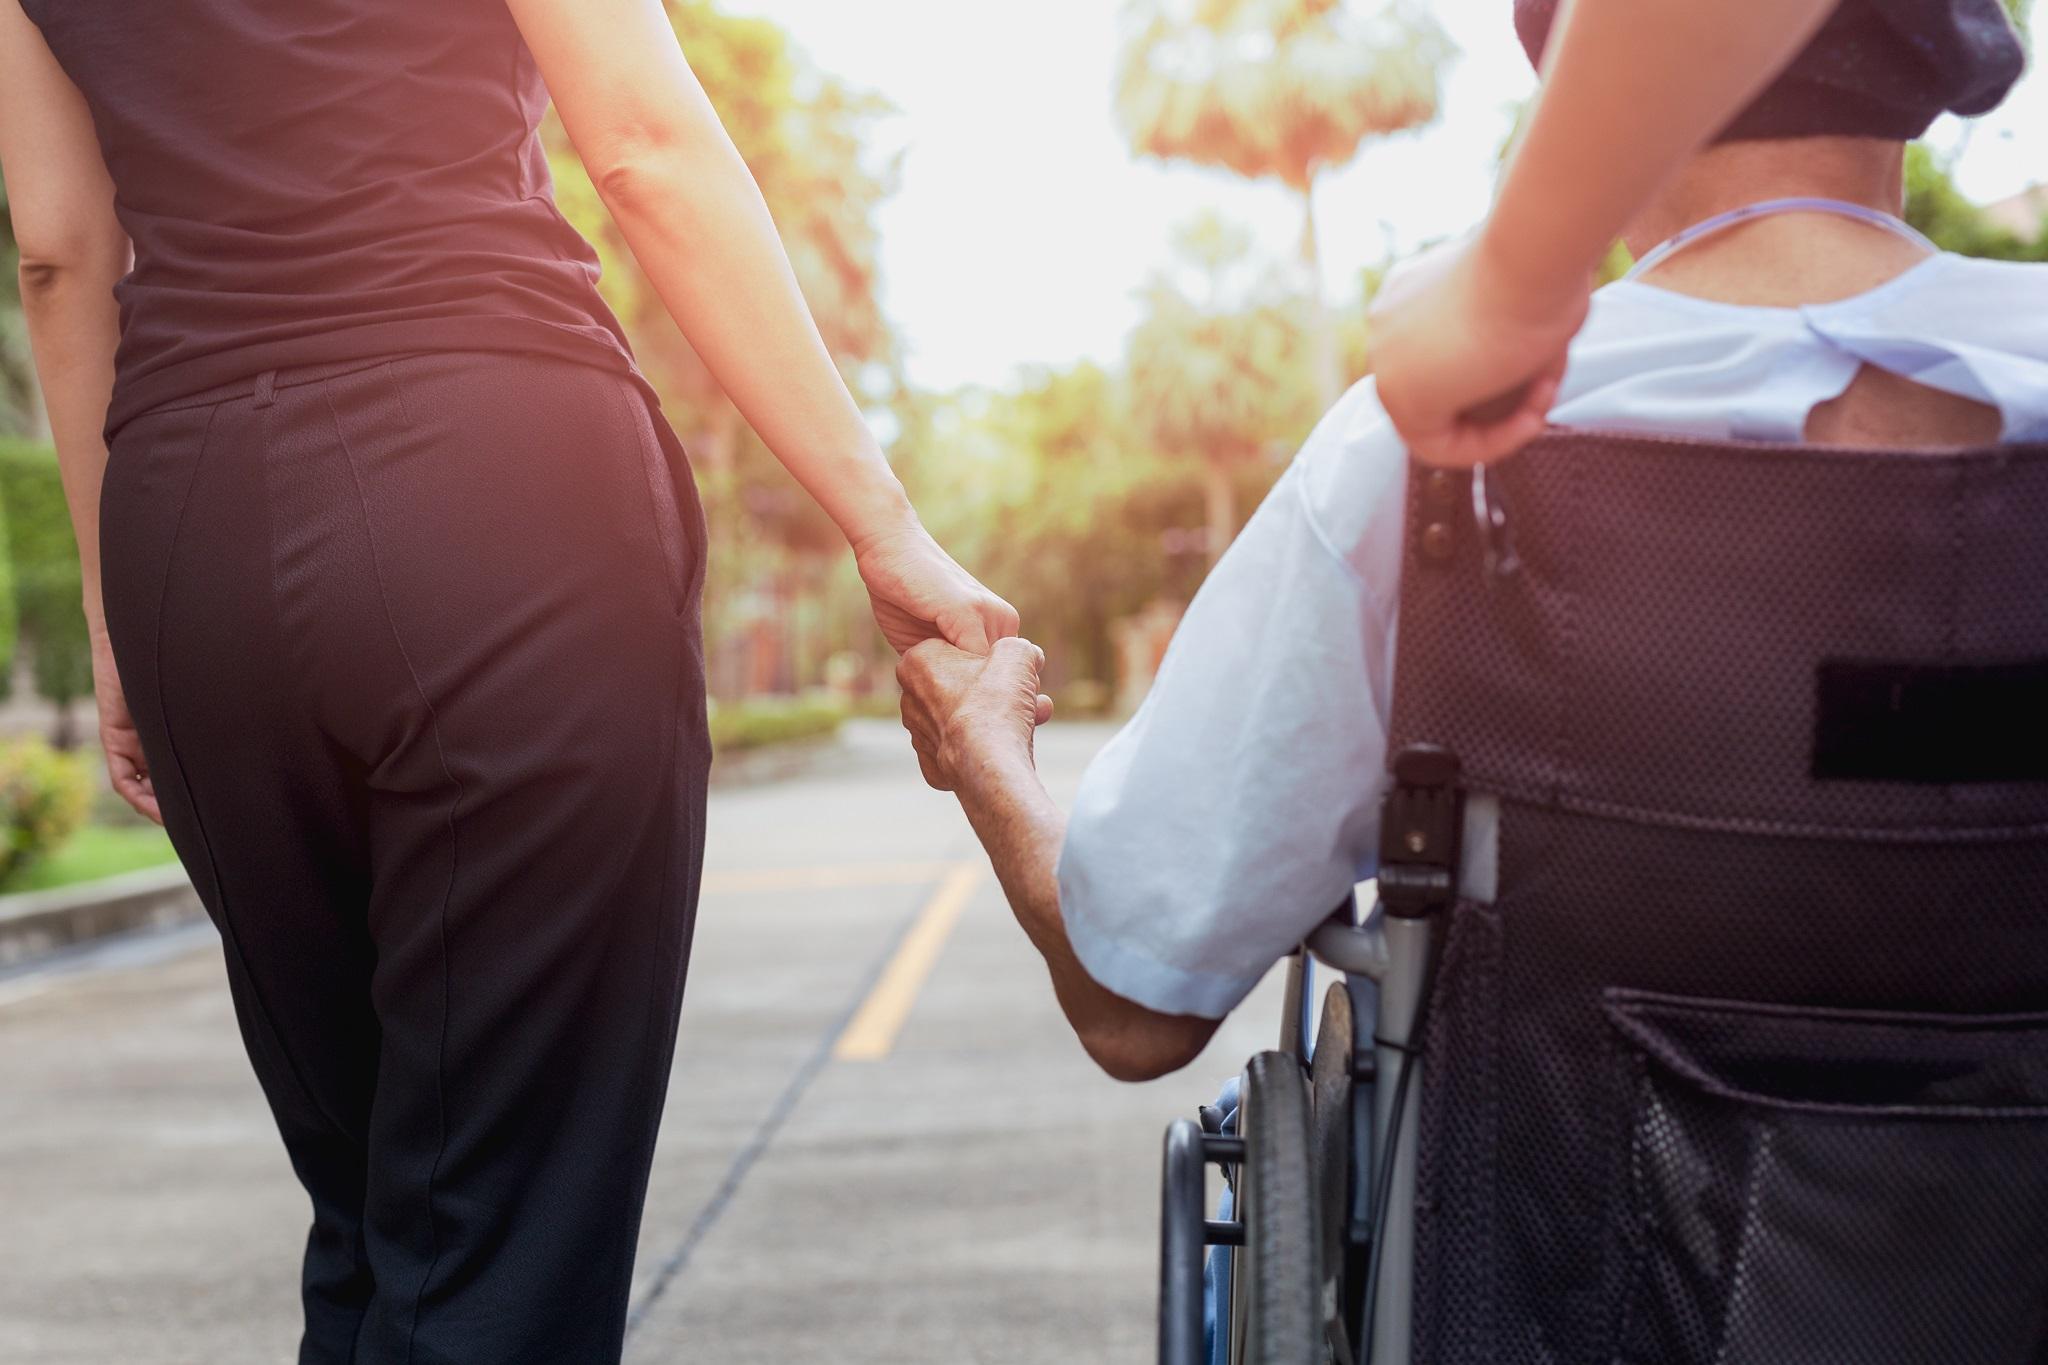 Caretaker Care Plans